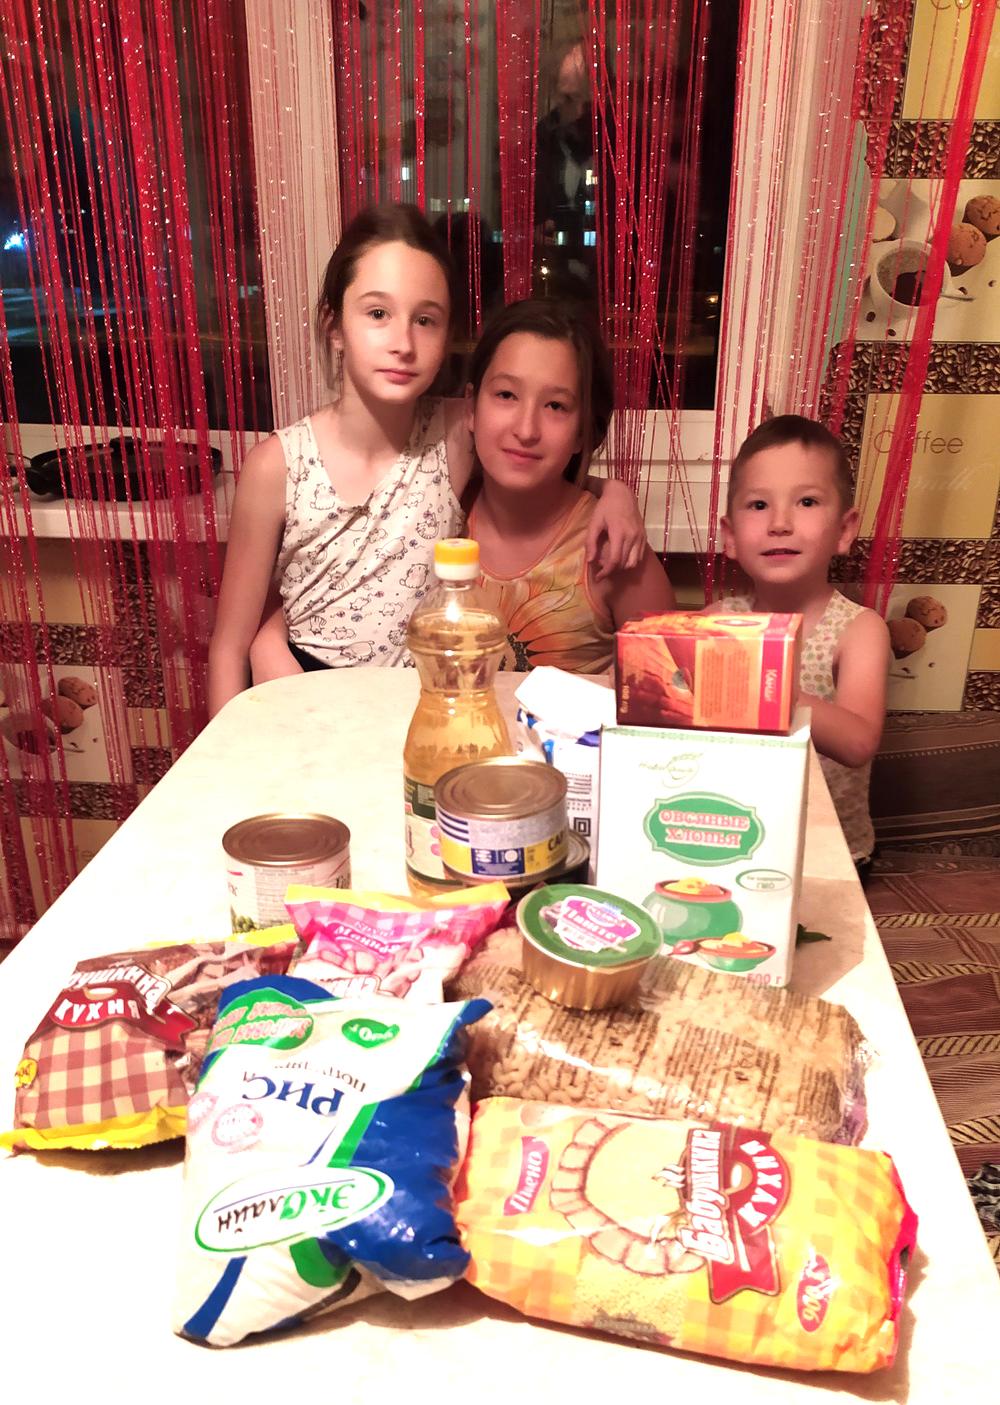 Svetlana and her two children.